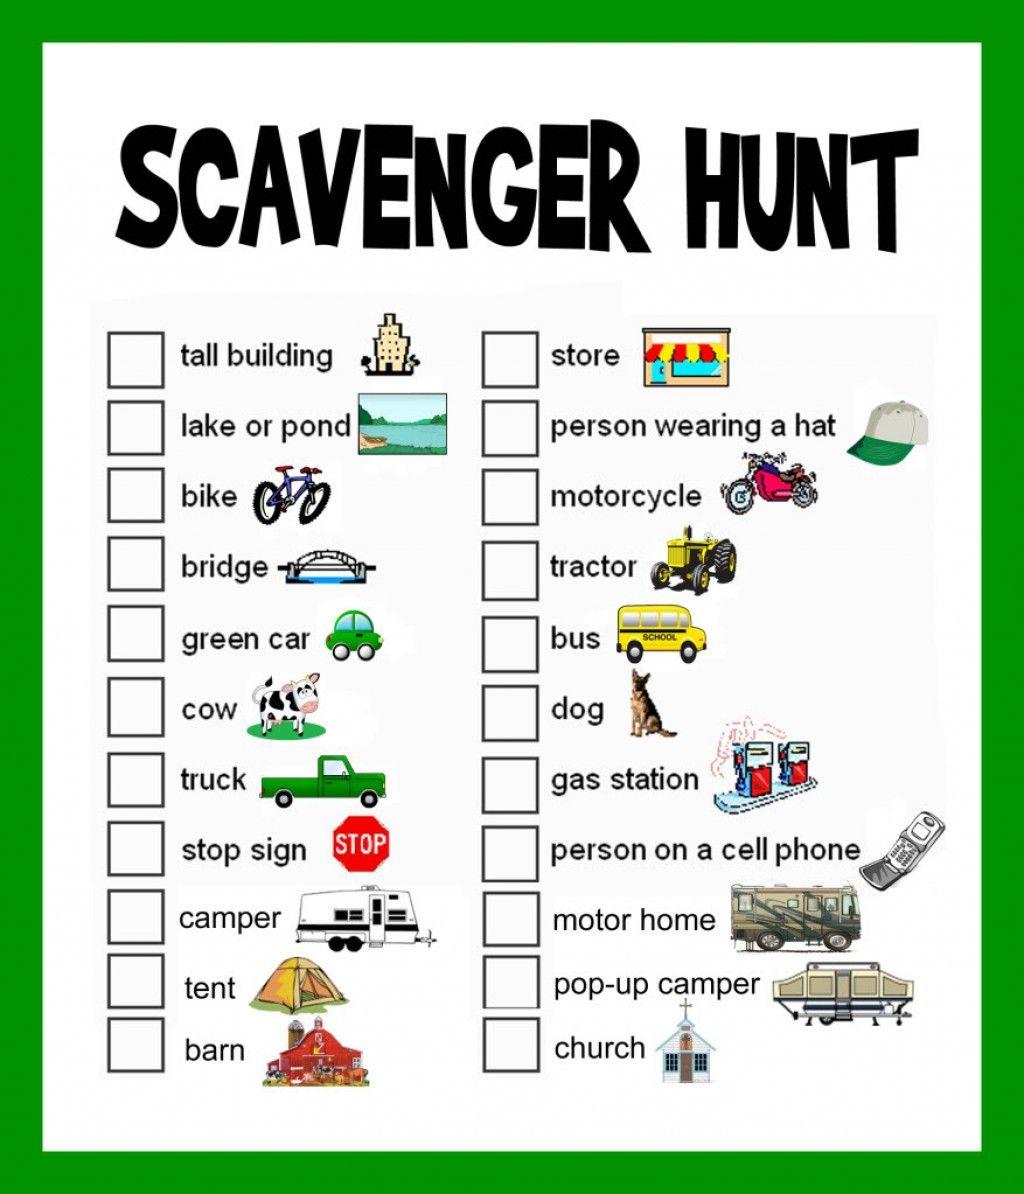 Great Road Trip Ideas: 5 Super Fun Scavenger Hunt Ideas